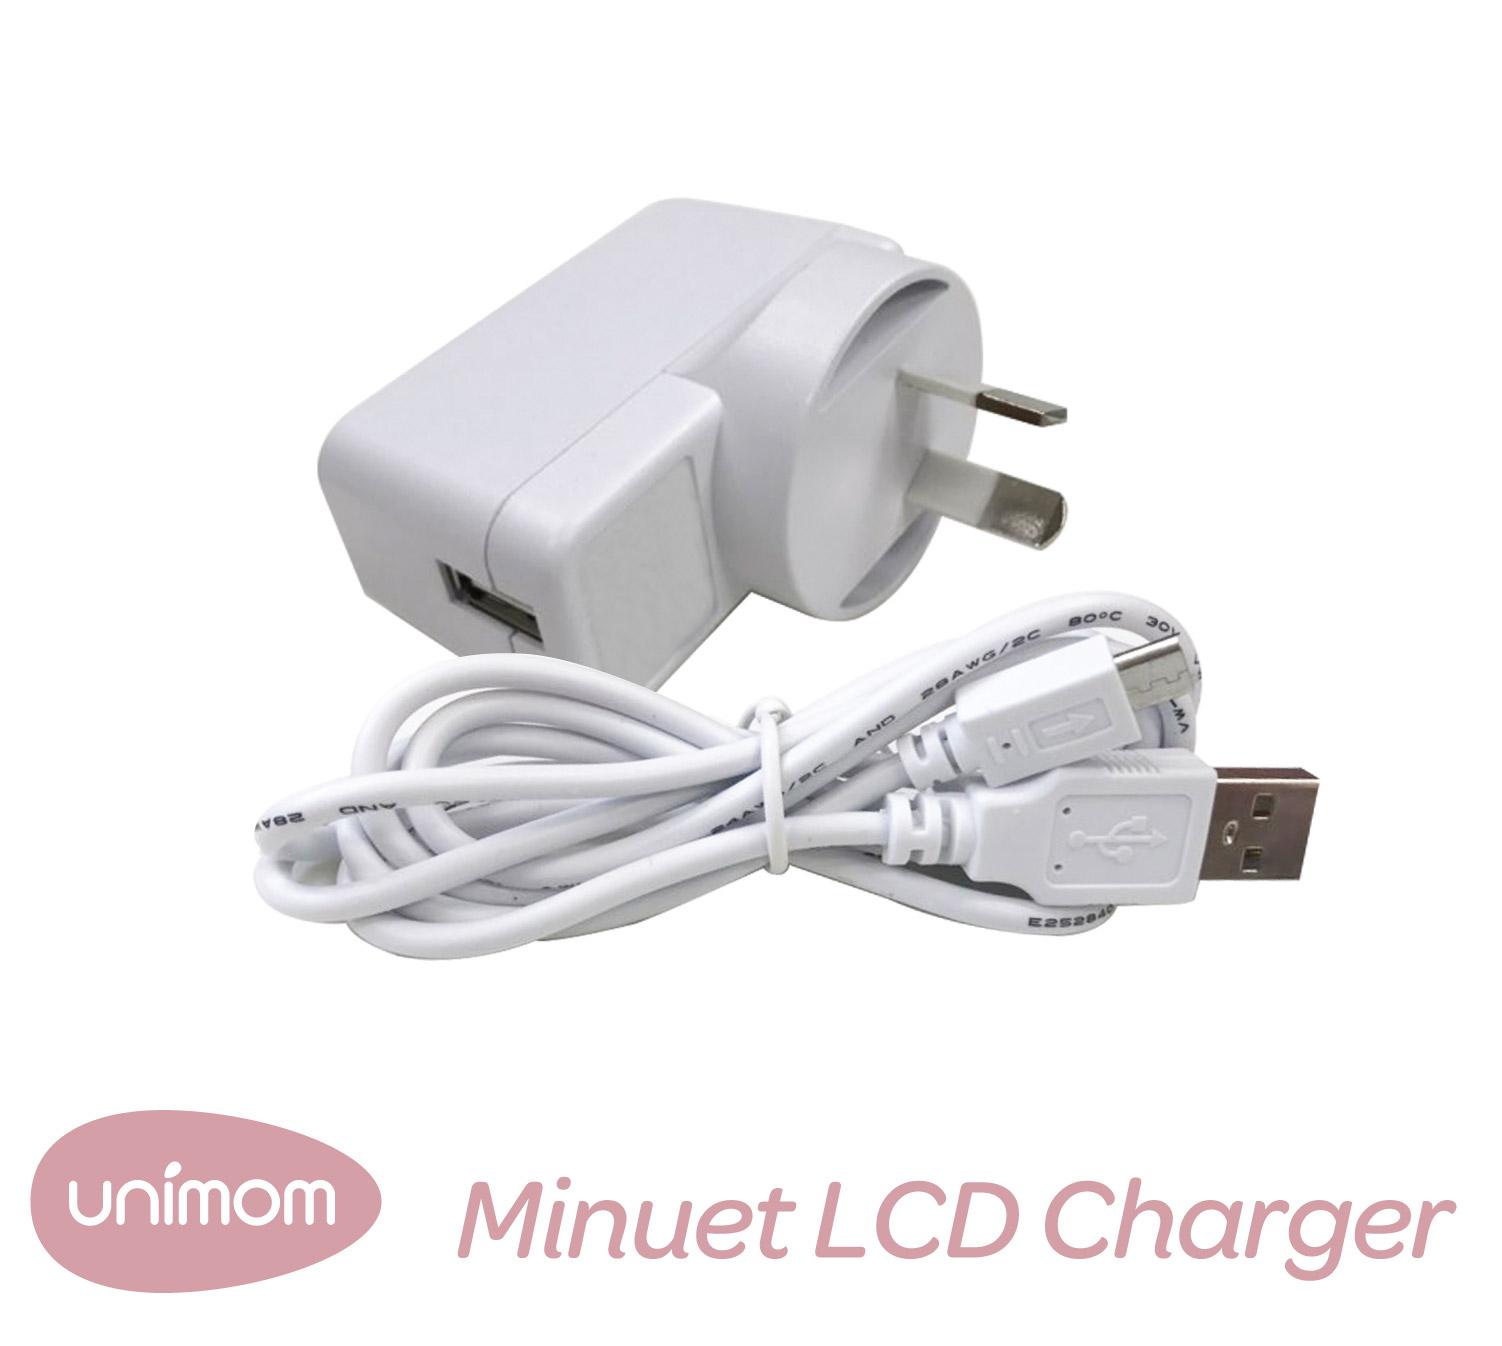 Unimom_Minuet-LCD-Charger.jpg